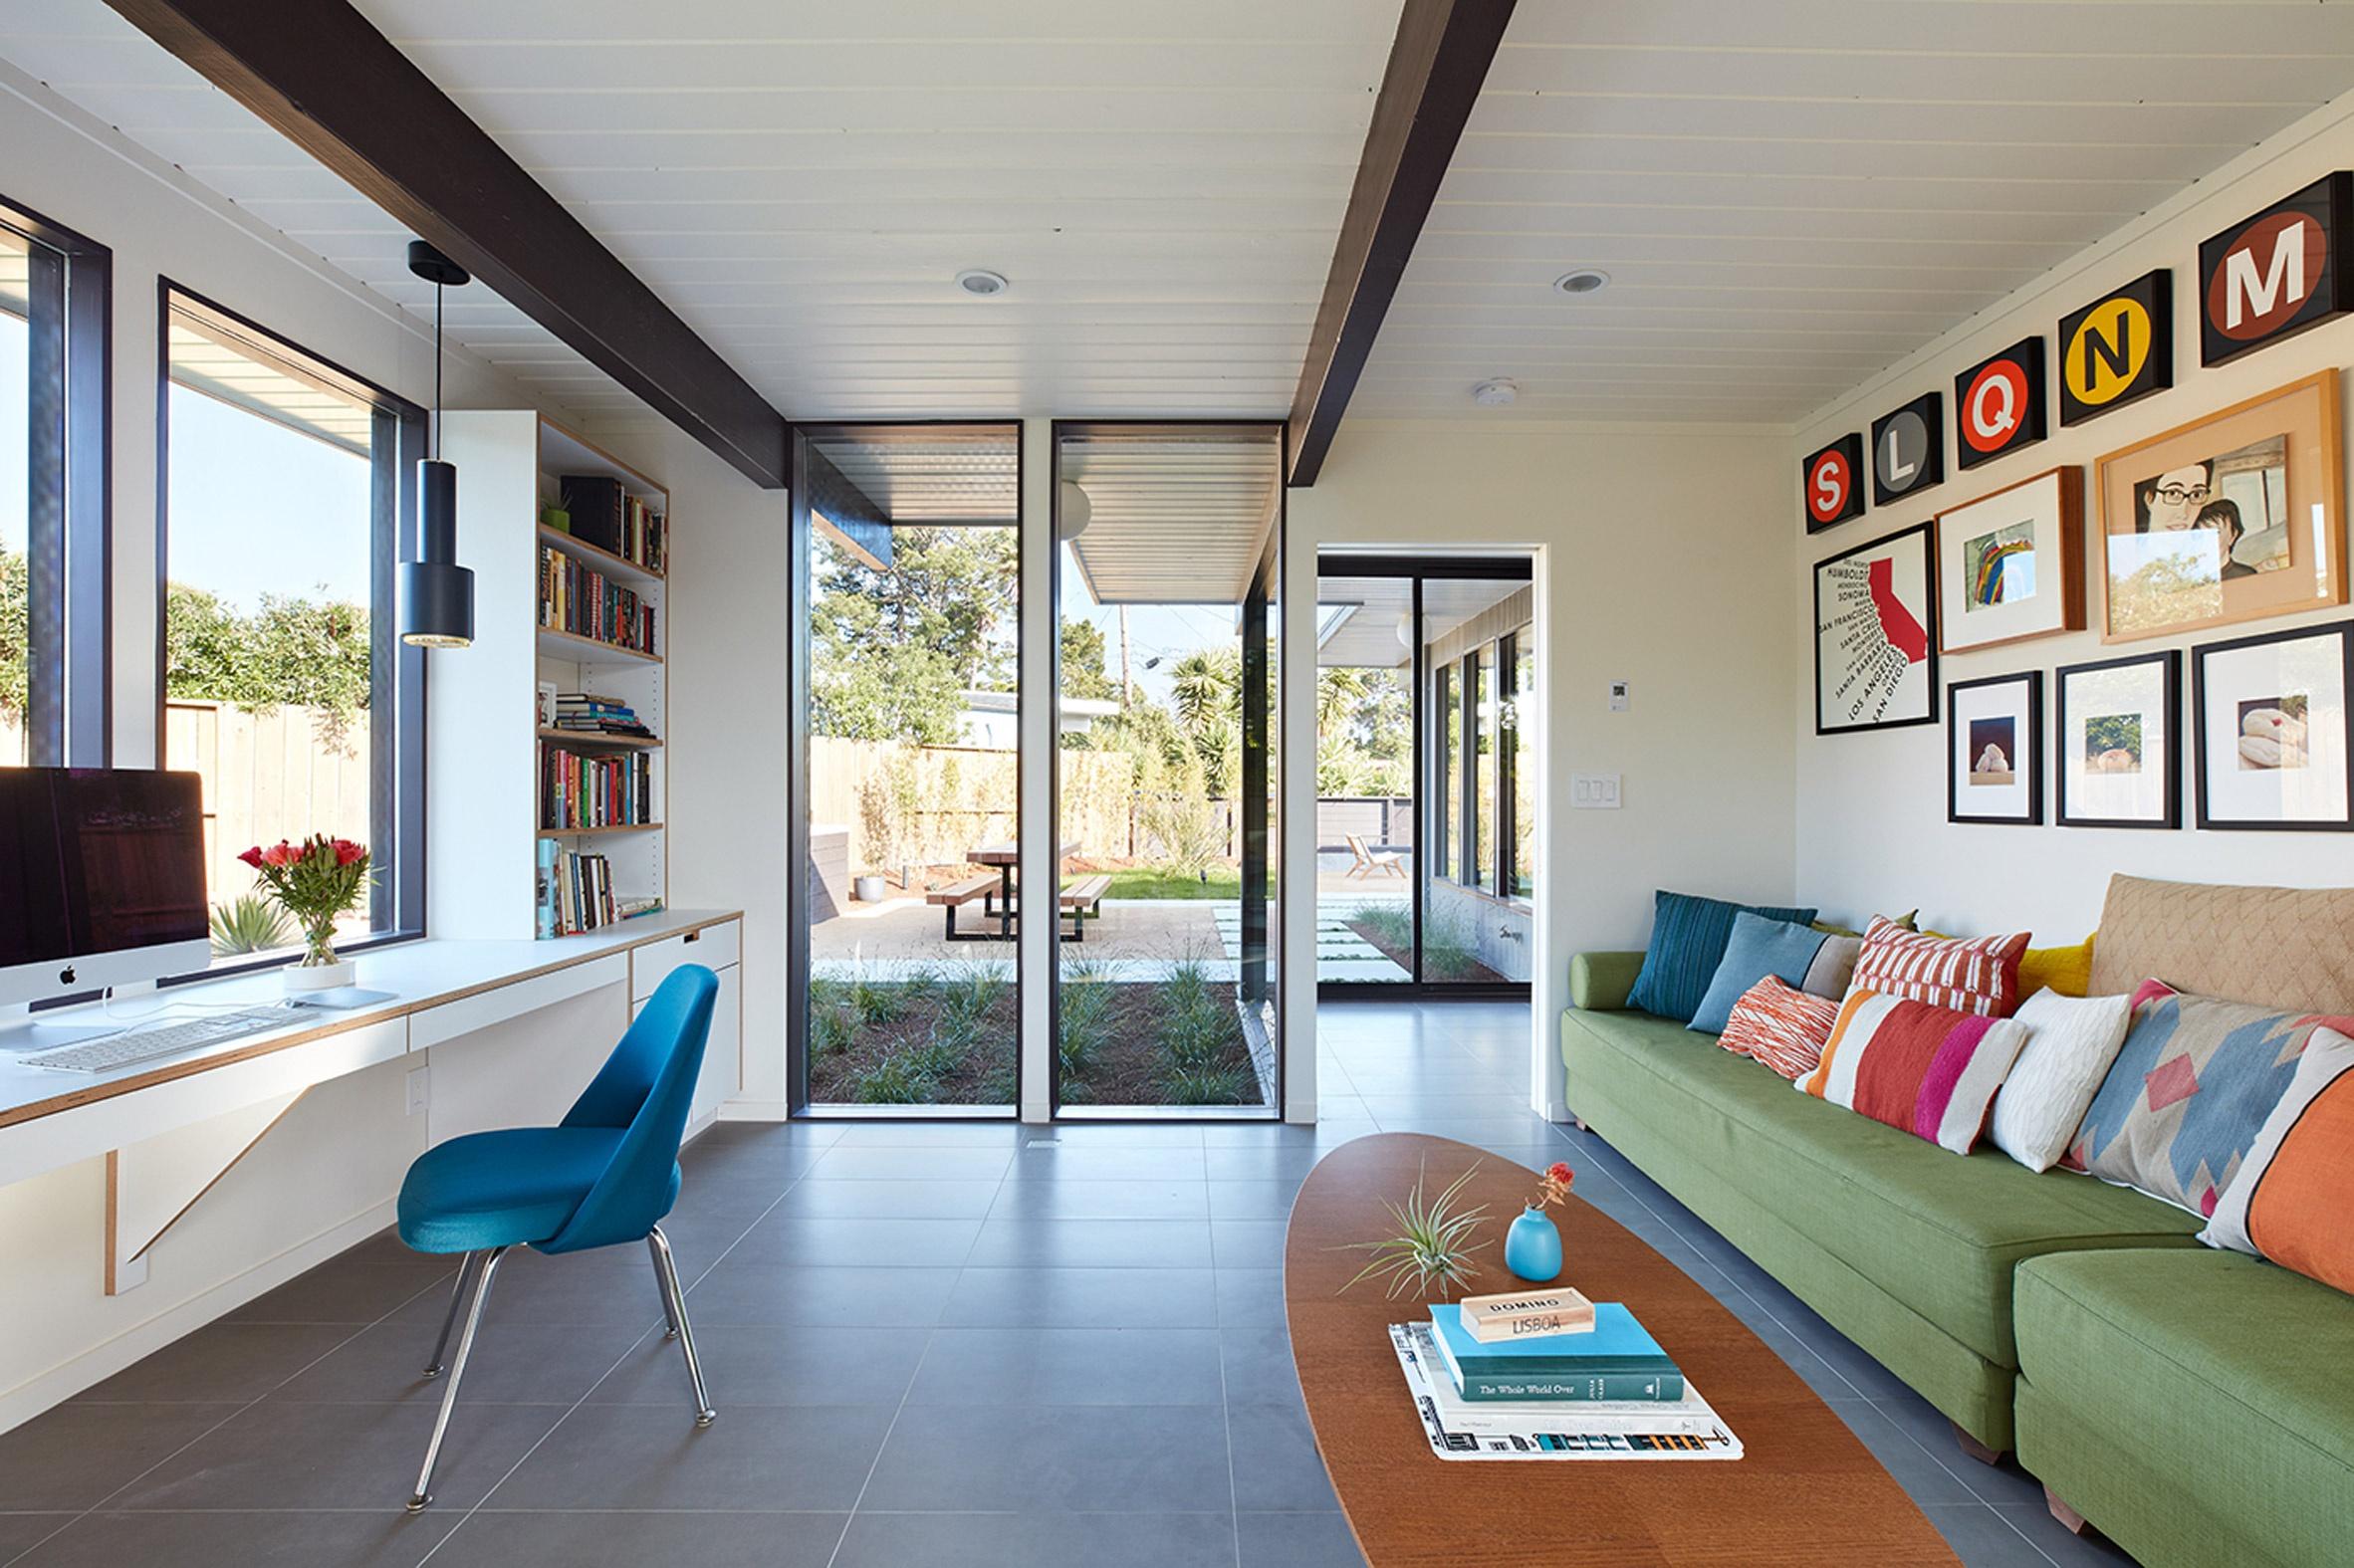 san-mateo-eichler-addition-remodel-klopf-architecture-residential-blue-house-usa_dezeen_2364_col_3